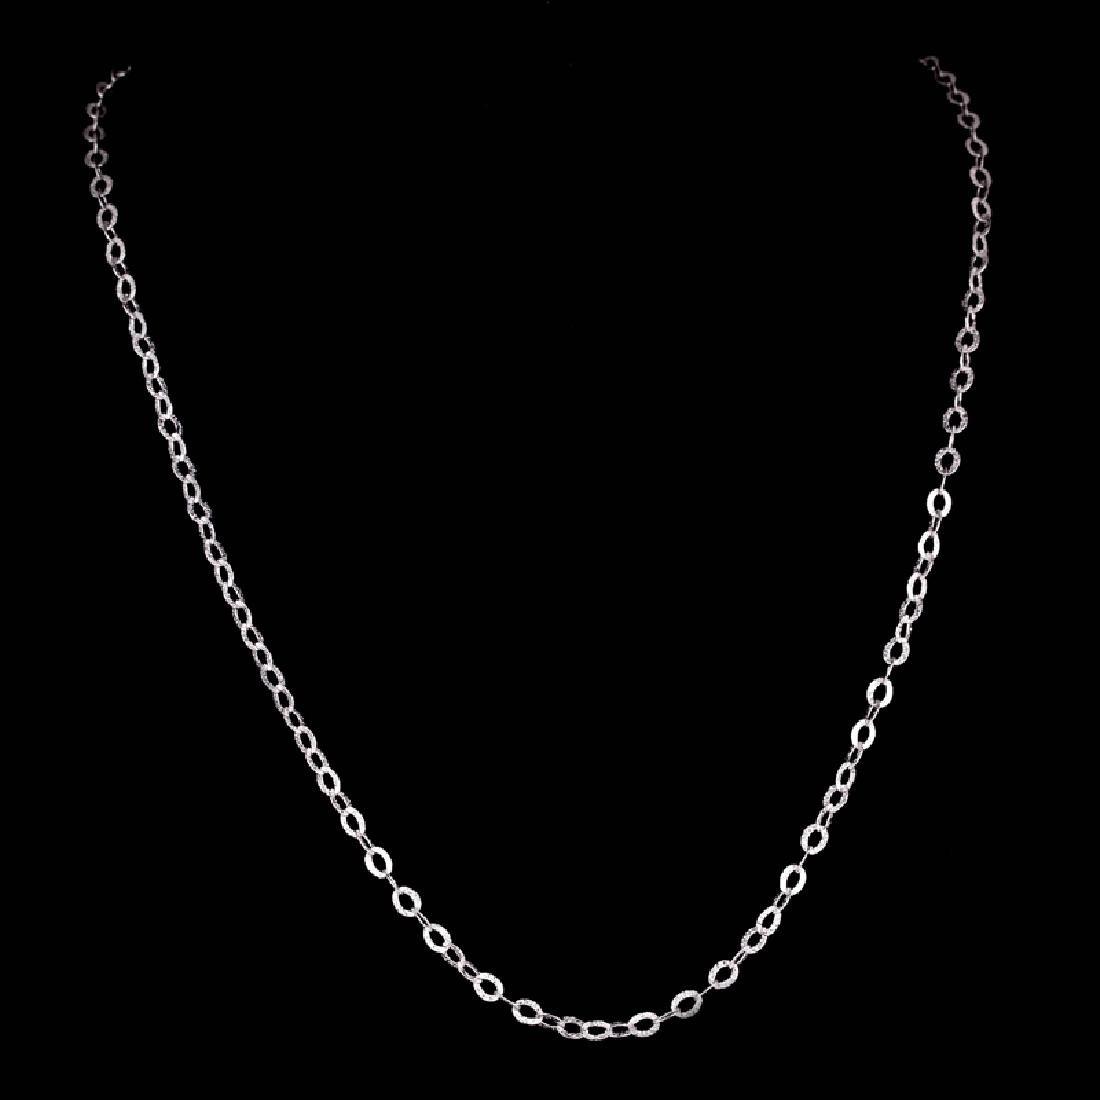 *Fine Jewelry 14 KT White Gold, 3.3GR, 18'' Corrugated